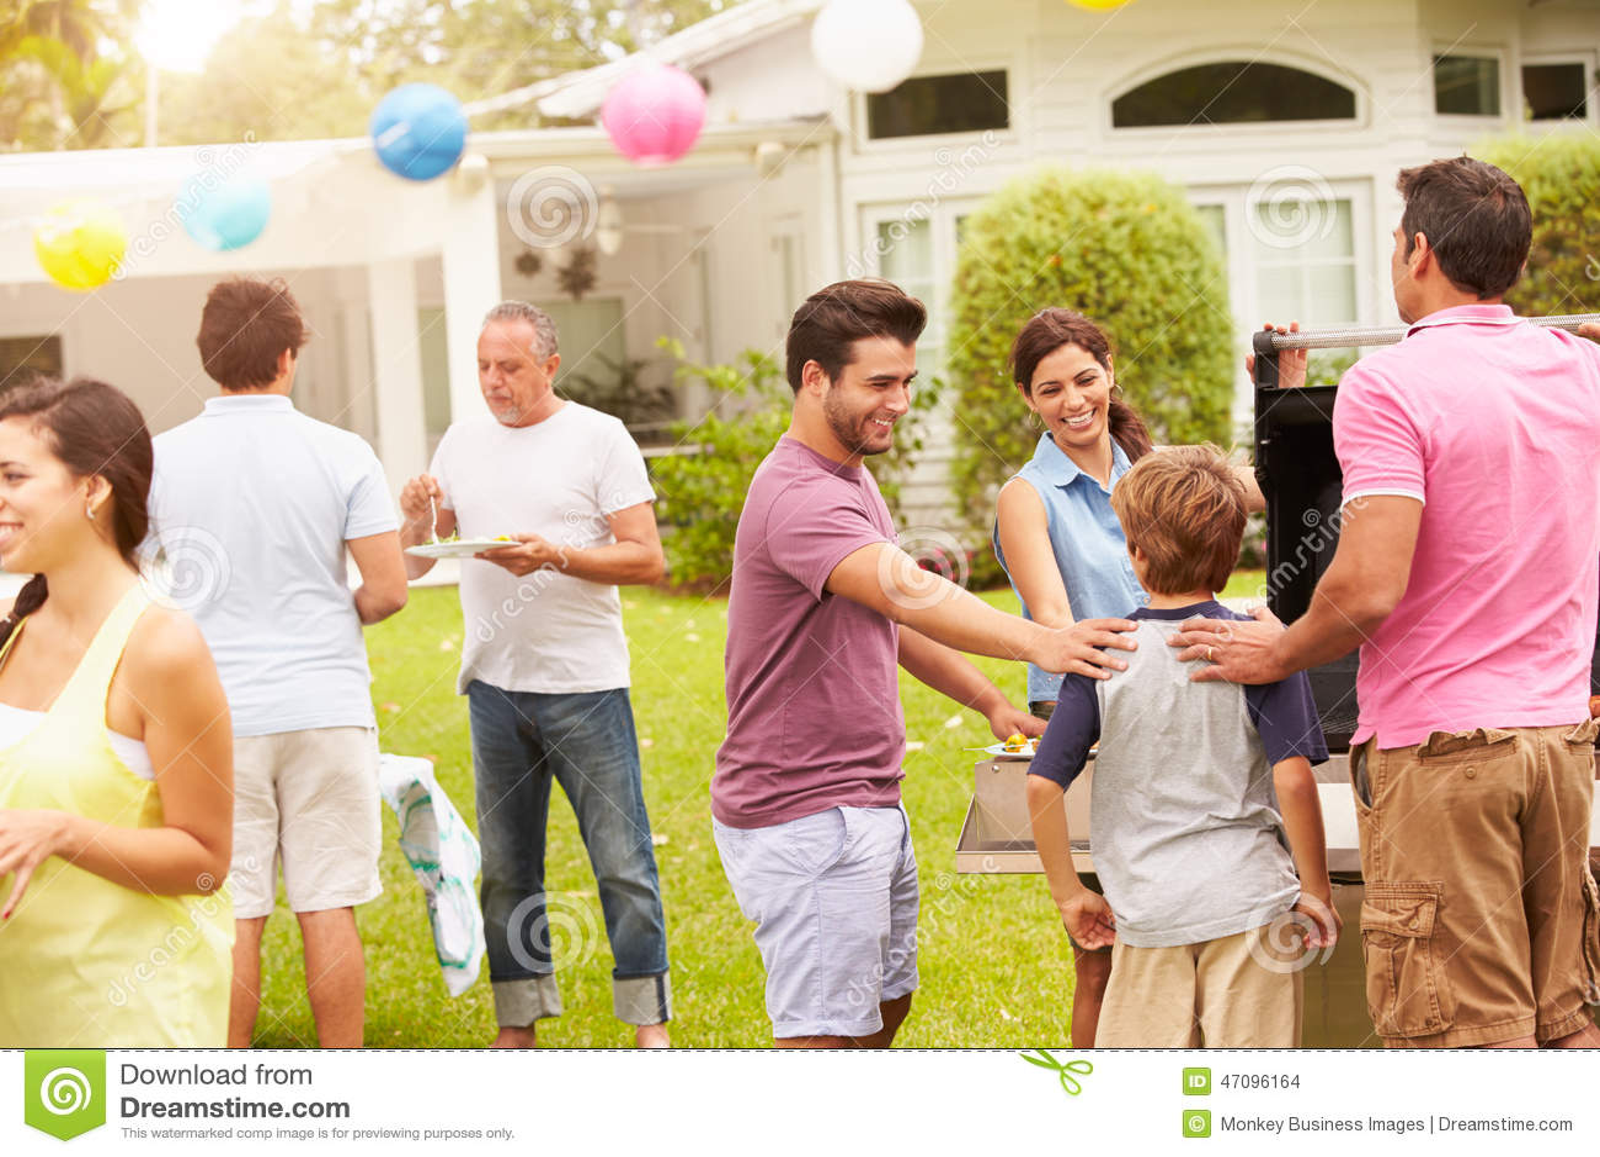 multi generation family enjoying party garden together 47096164